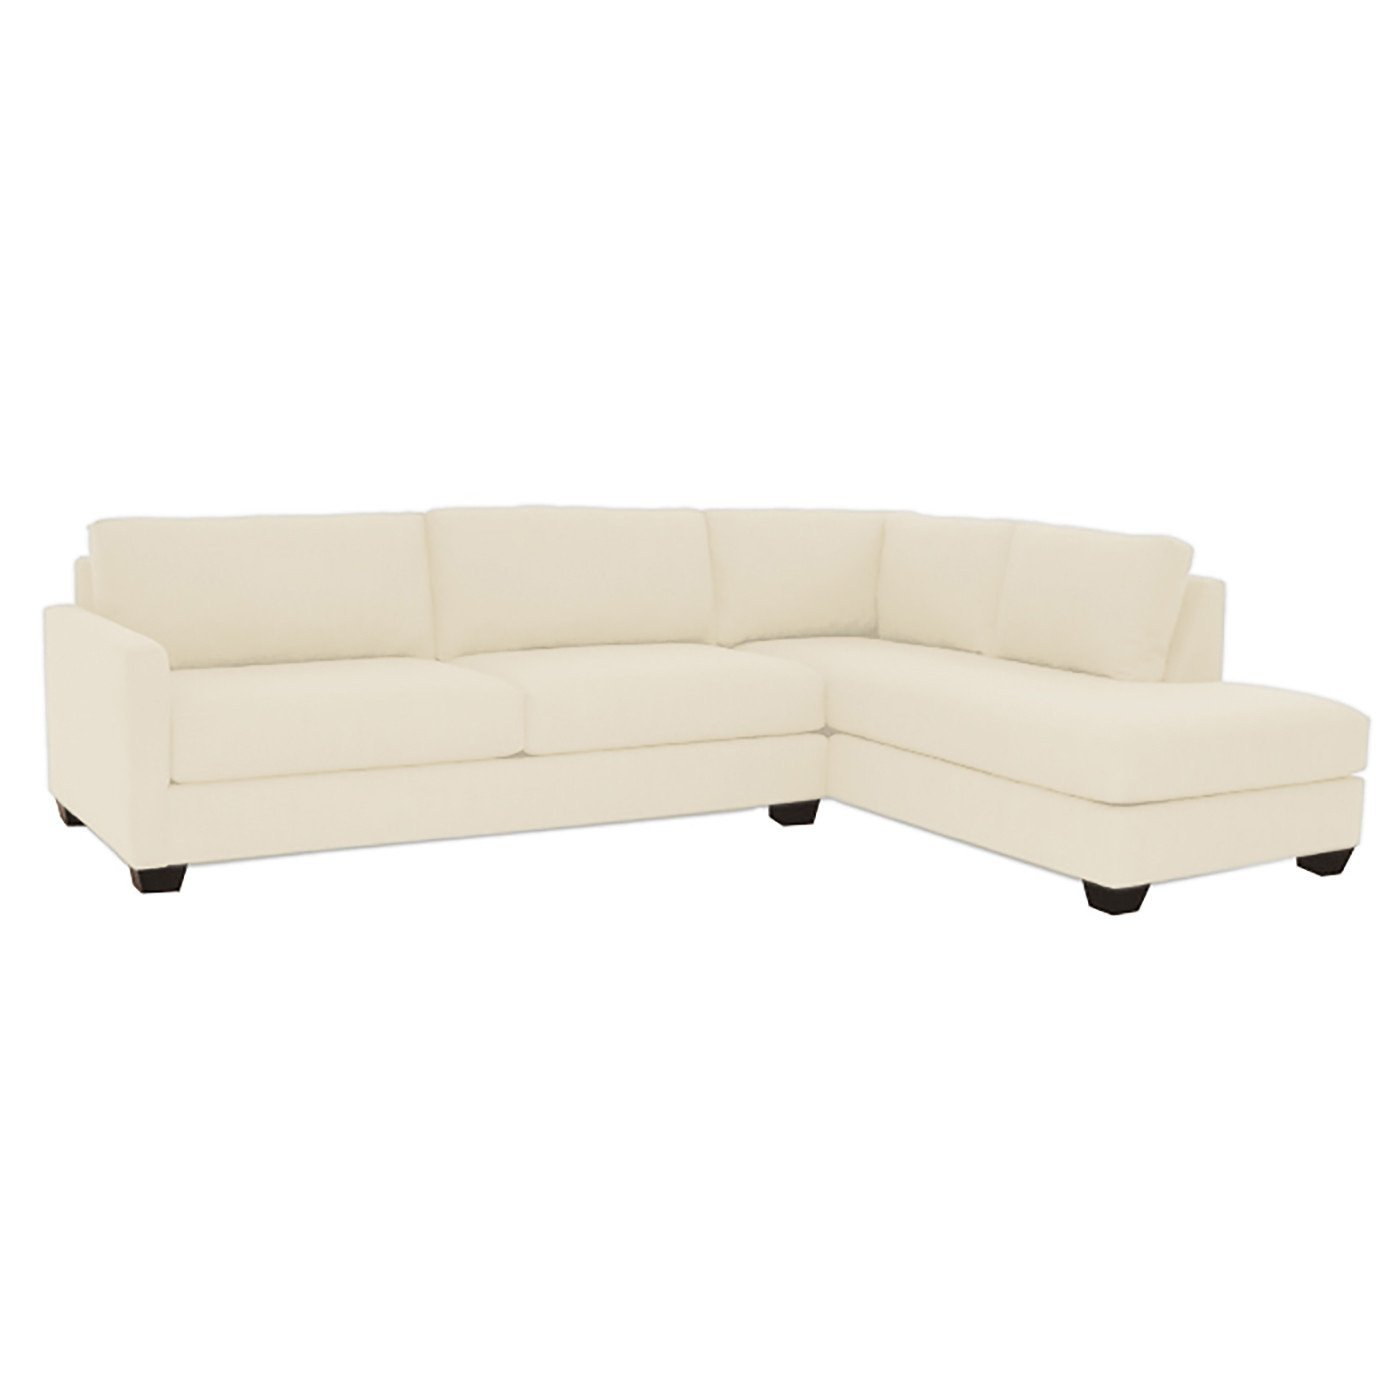 Amazon.com: Tuxedo 2-Piece Sectional Sofa, Buckwheat, RAF - Chaise ...